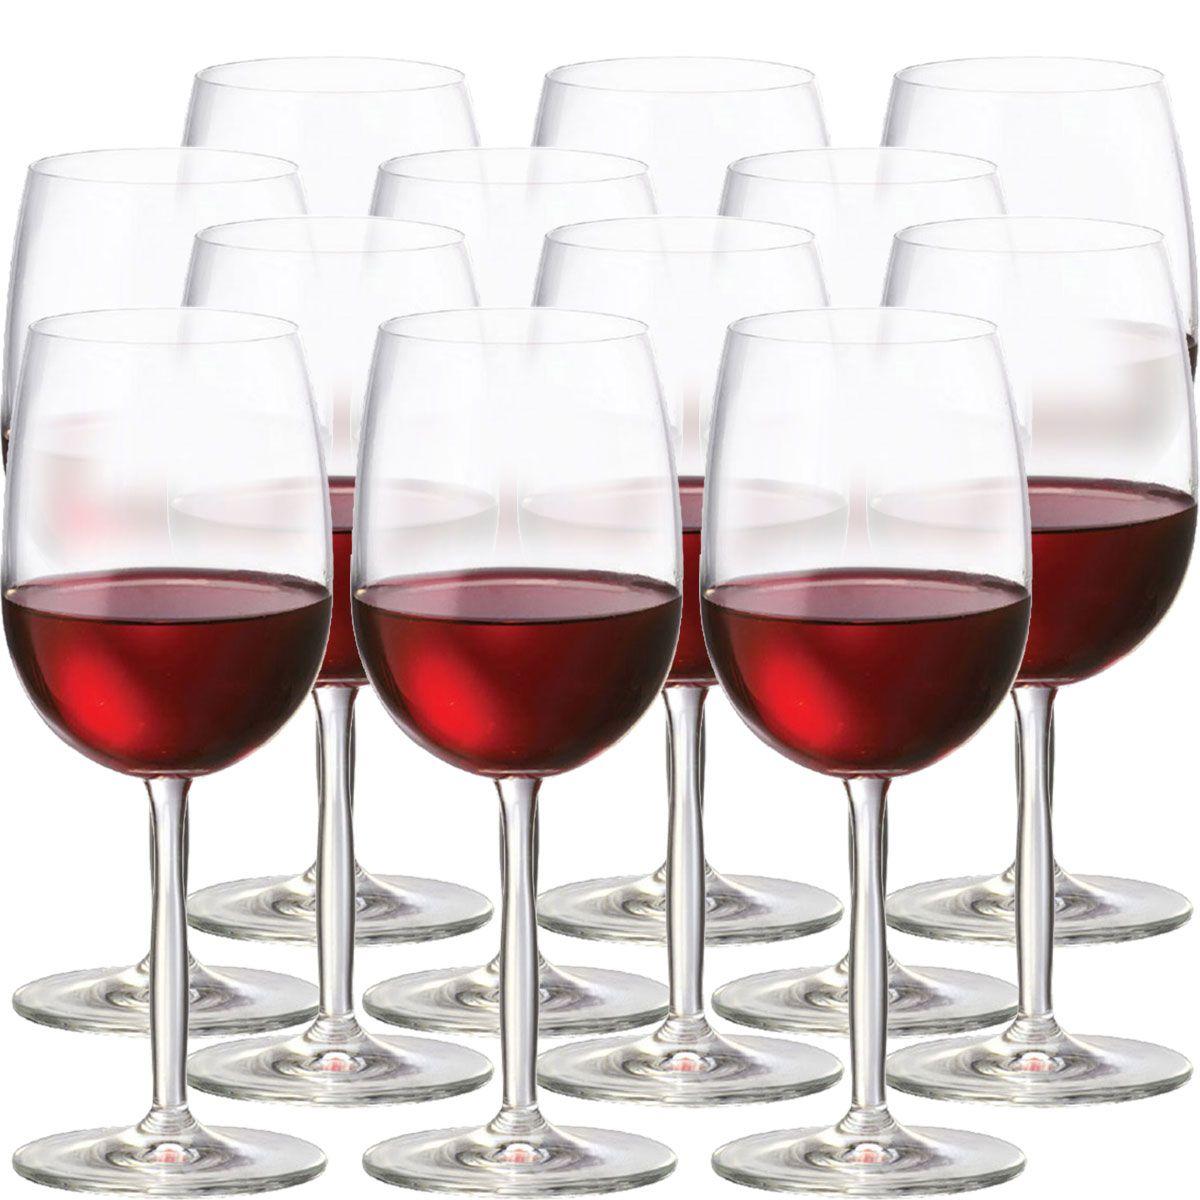 Jogo de Taça de Vinho Tinto Cristal Ritz 48ml 12 Pcs